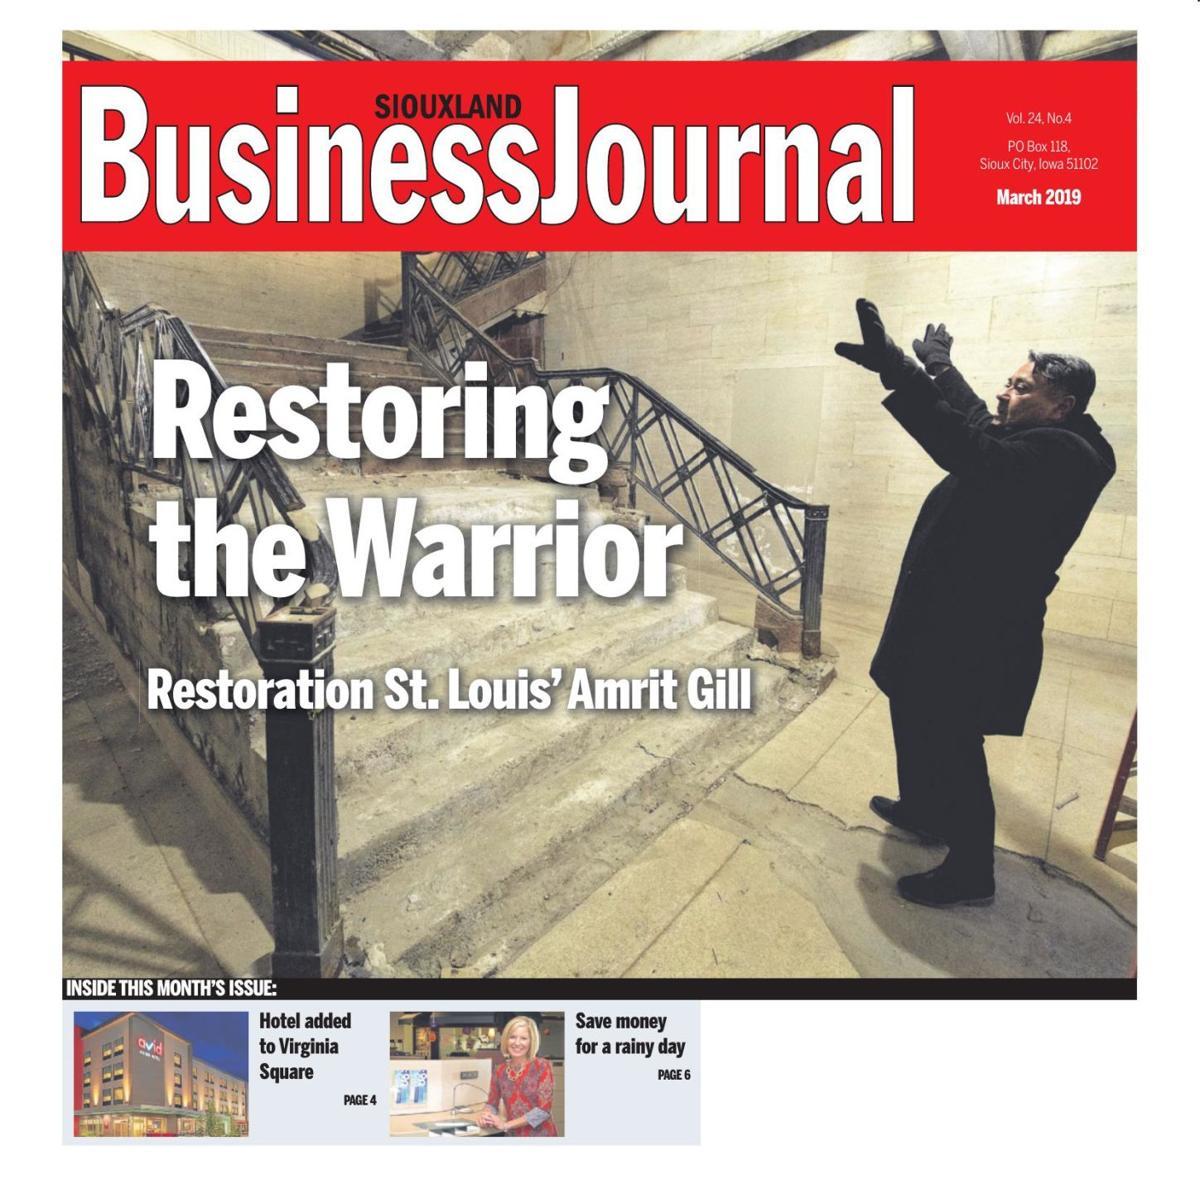 Siouxland Business Journal - March 2019